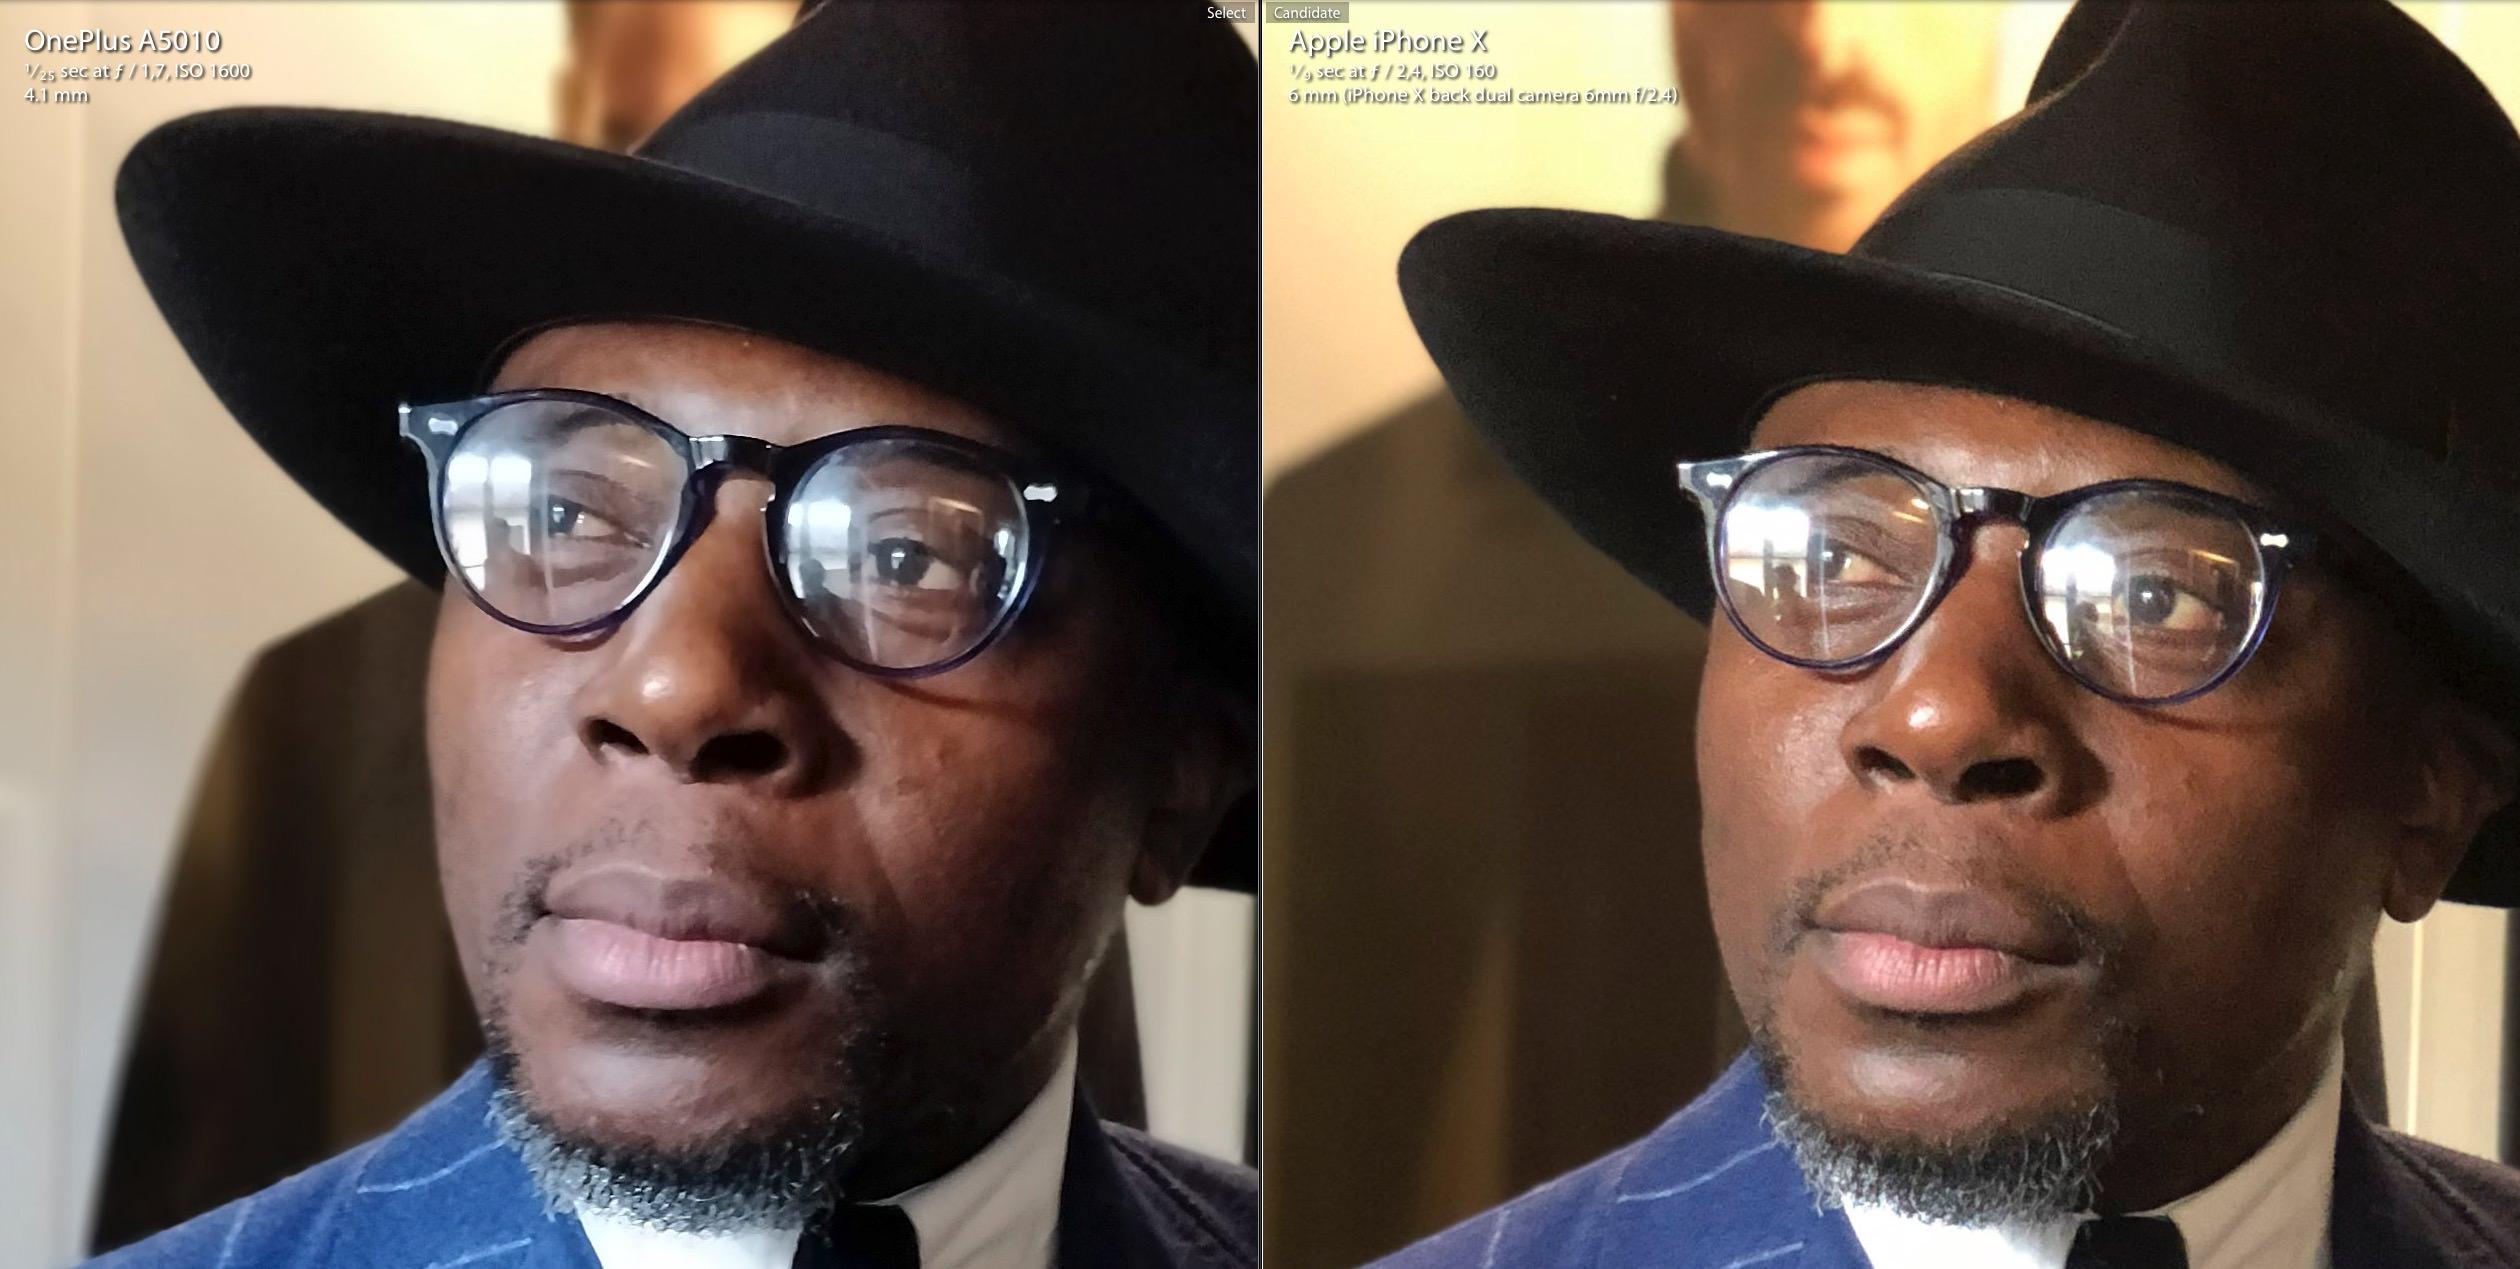 Detail Portrait Mode OnePlus 5T vs iPhone X